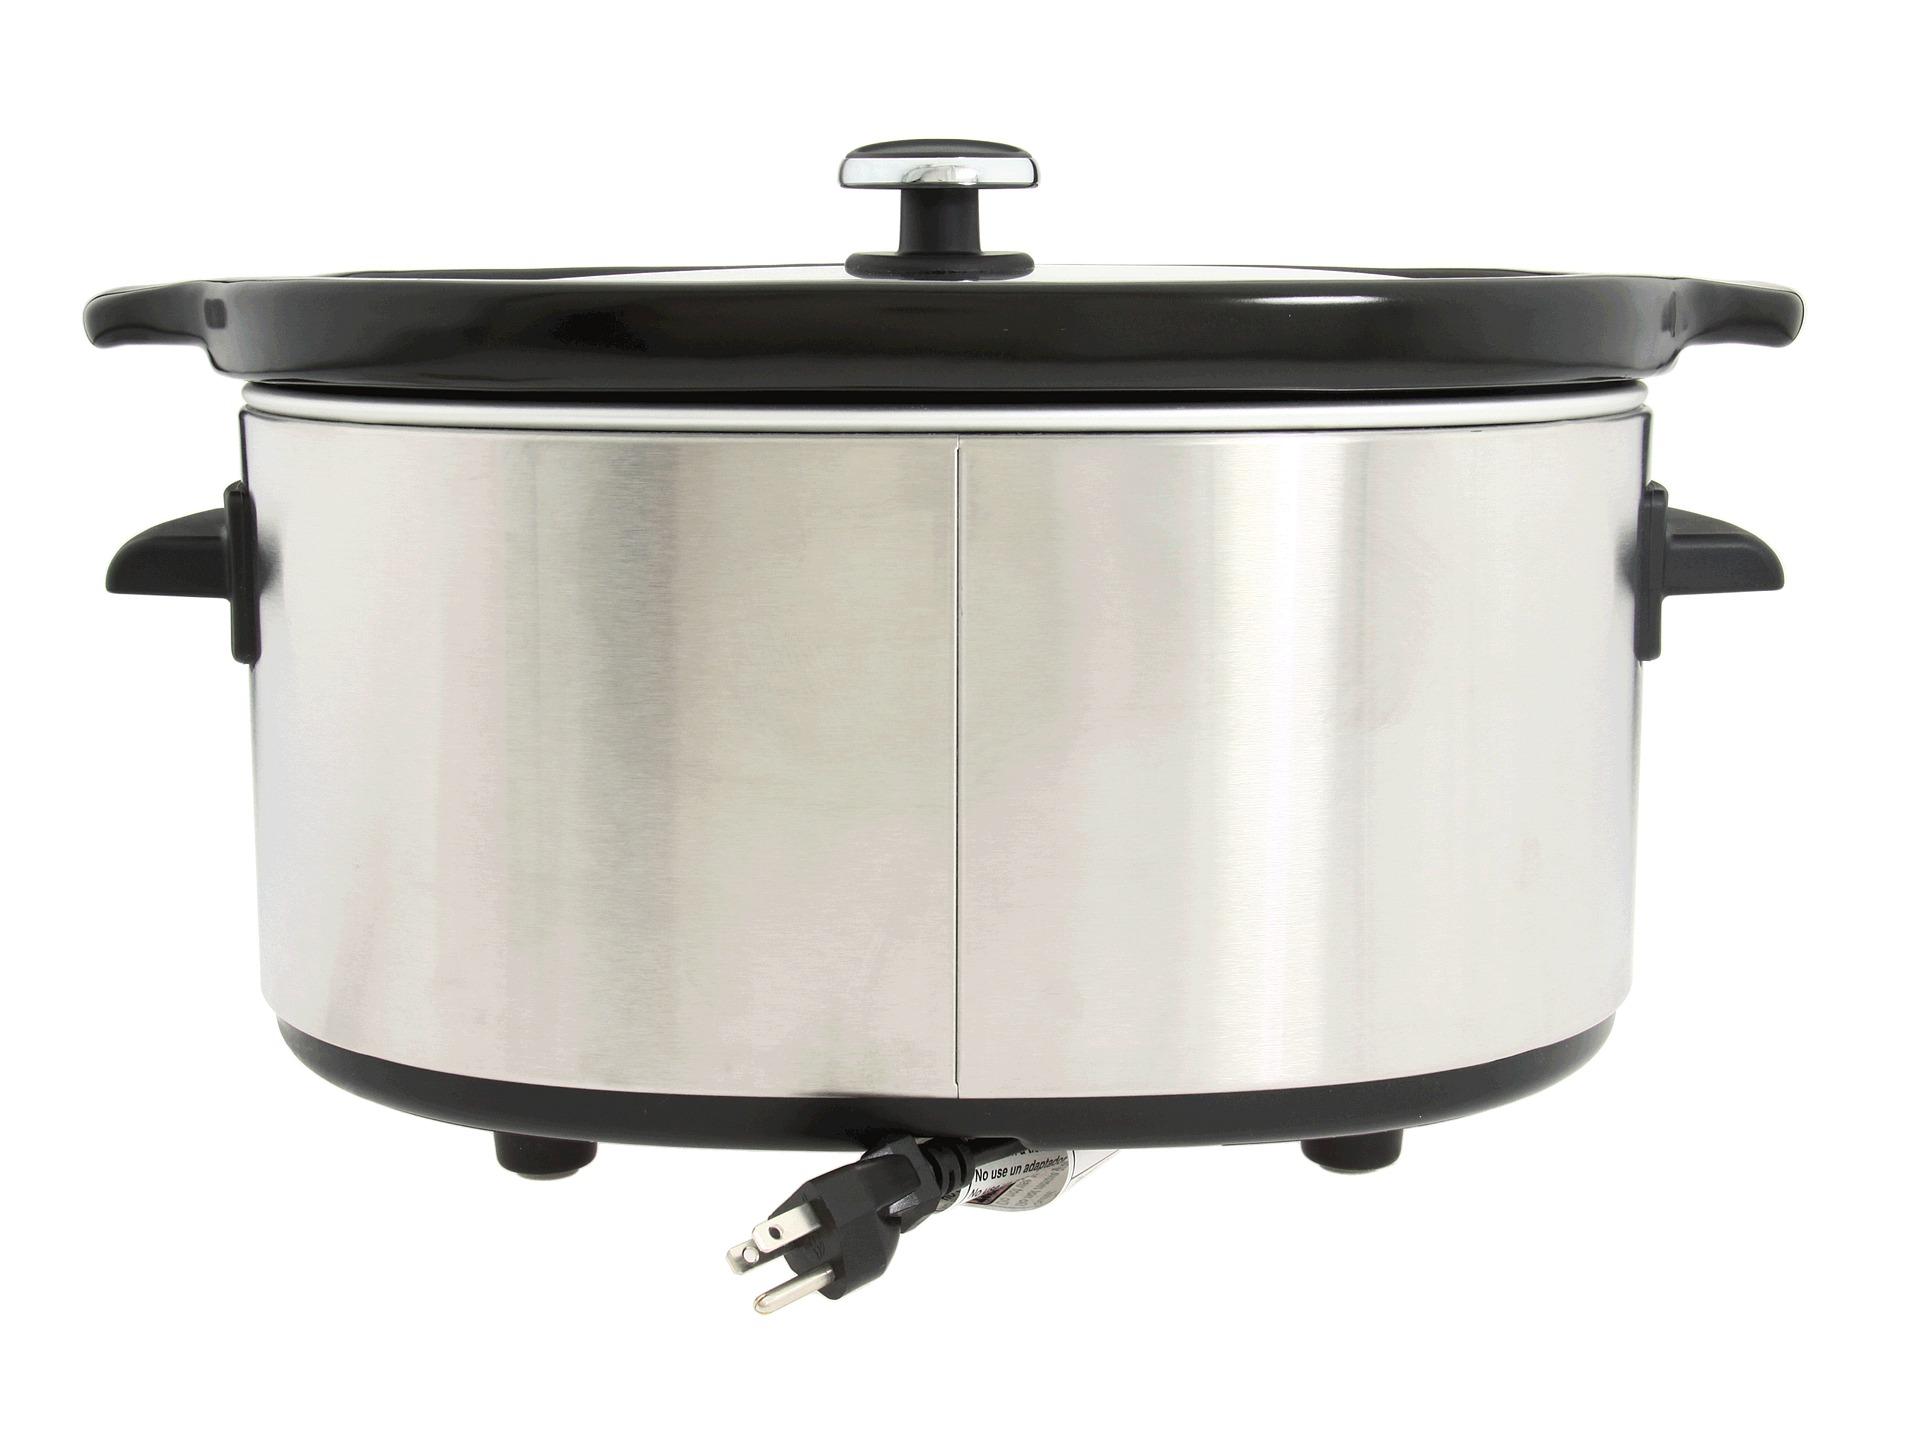 faucet sink kitchenaid 7 quart slow cooker reviews who cried